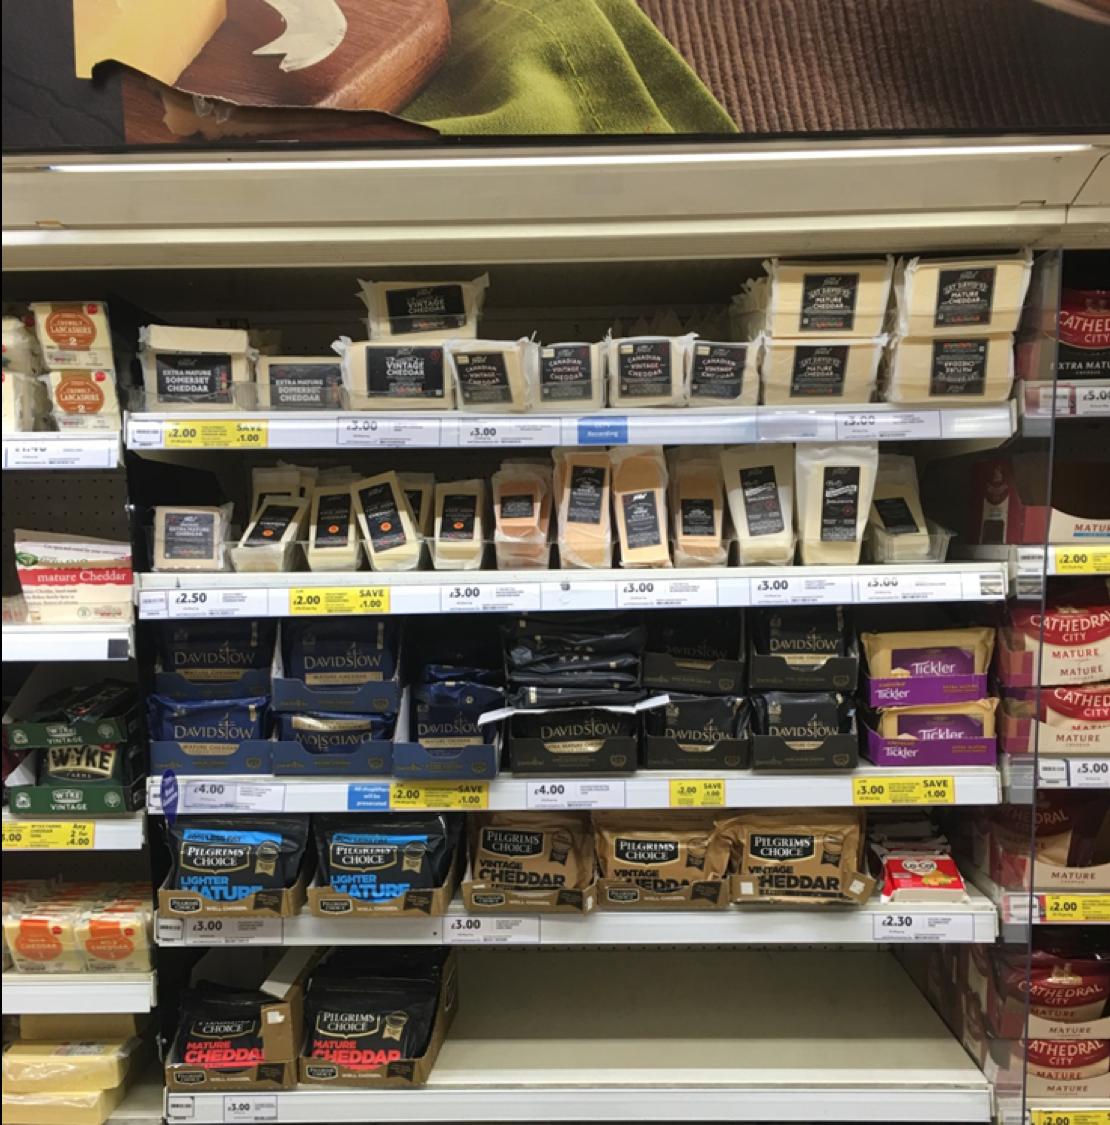 Shopper Insights shelf